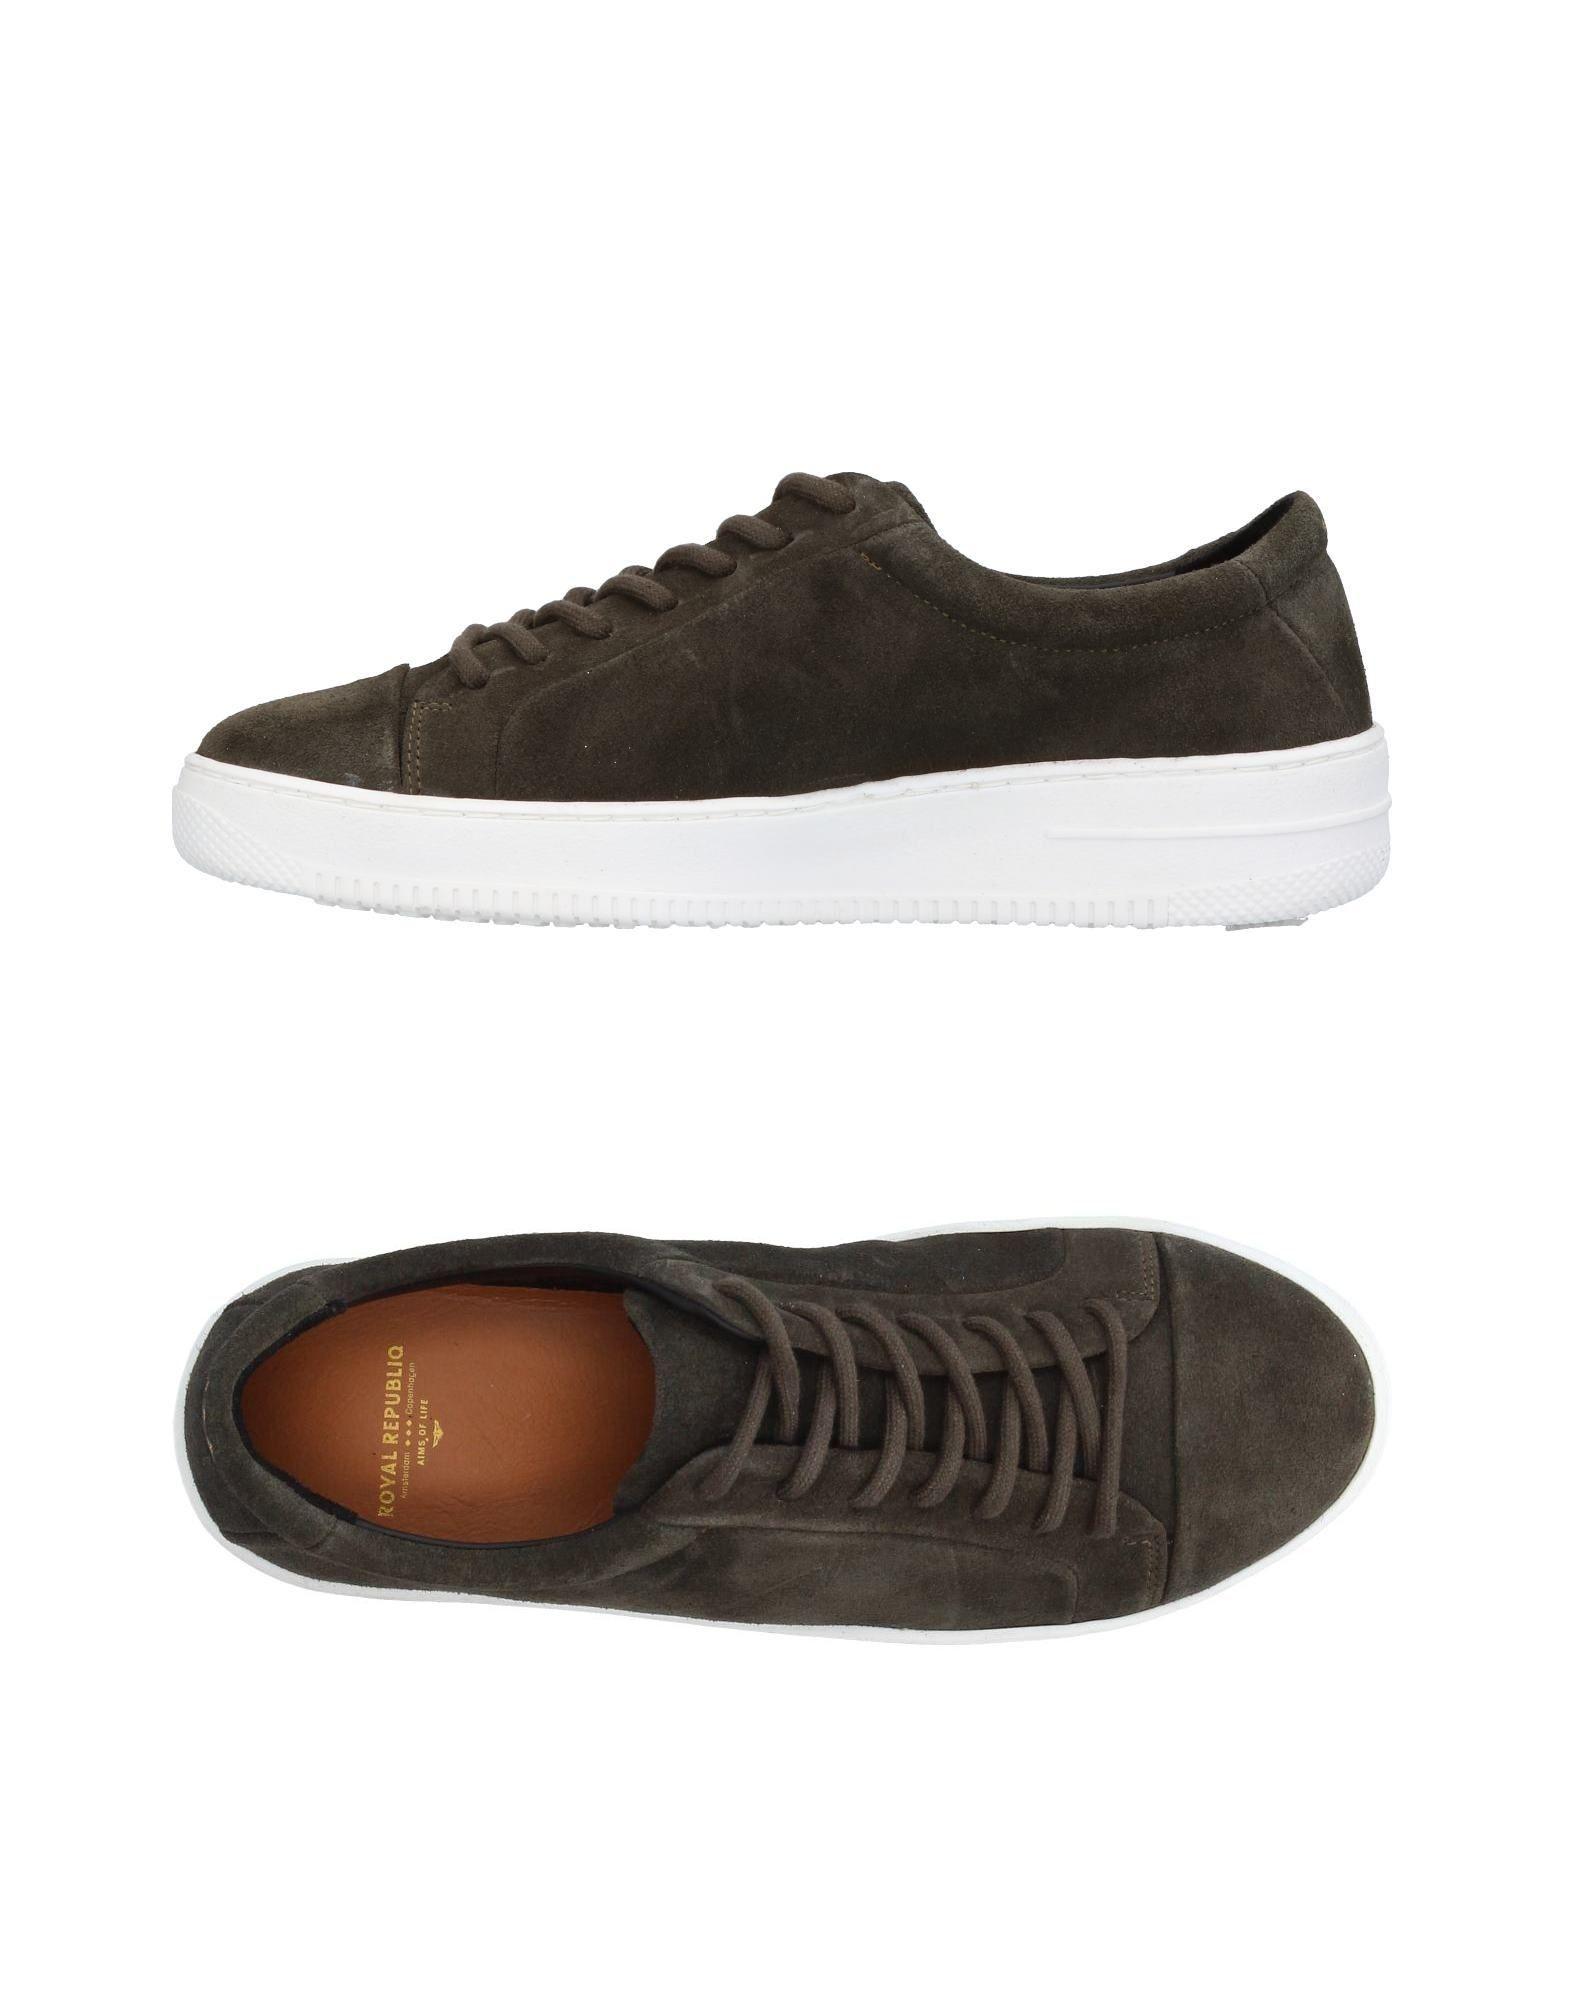 Rabatt echte Schuhe Royal Republiq Sneakers Herren  11385054AH